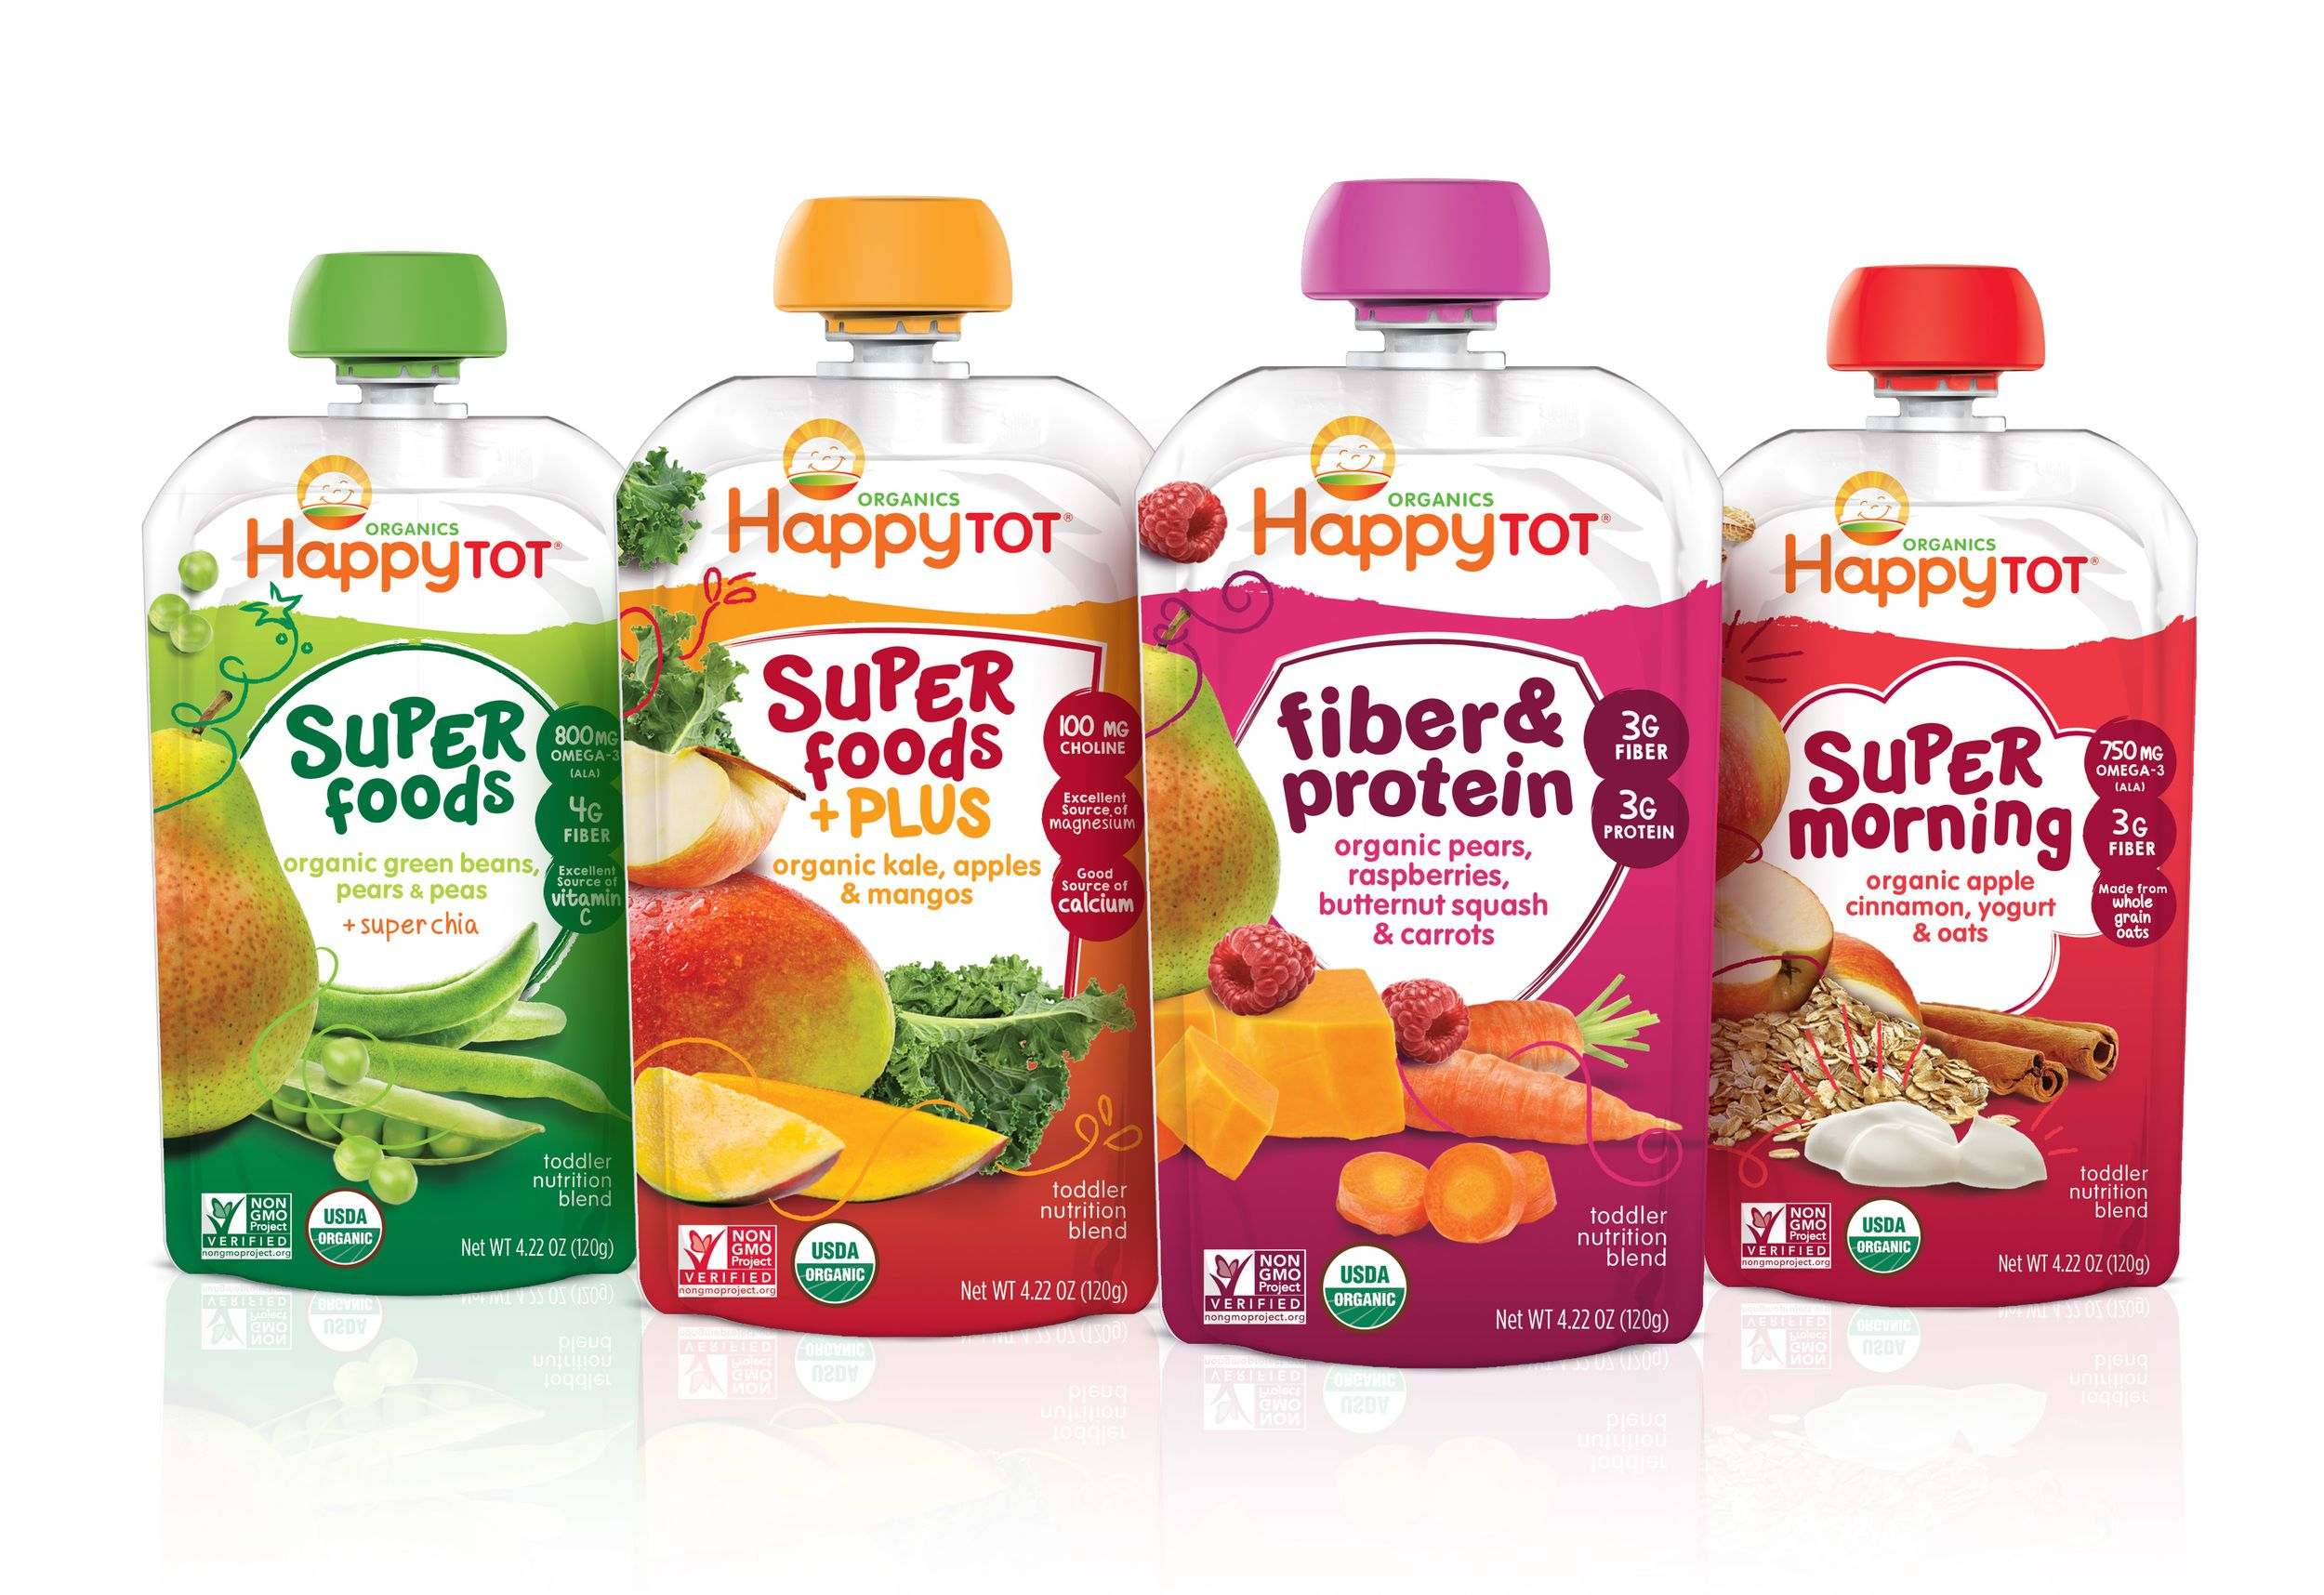 Happy Family's Tot Line — The Dieline - Branding & Packaging